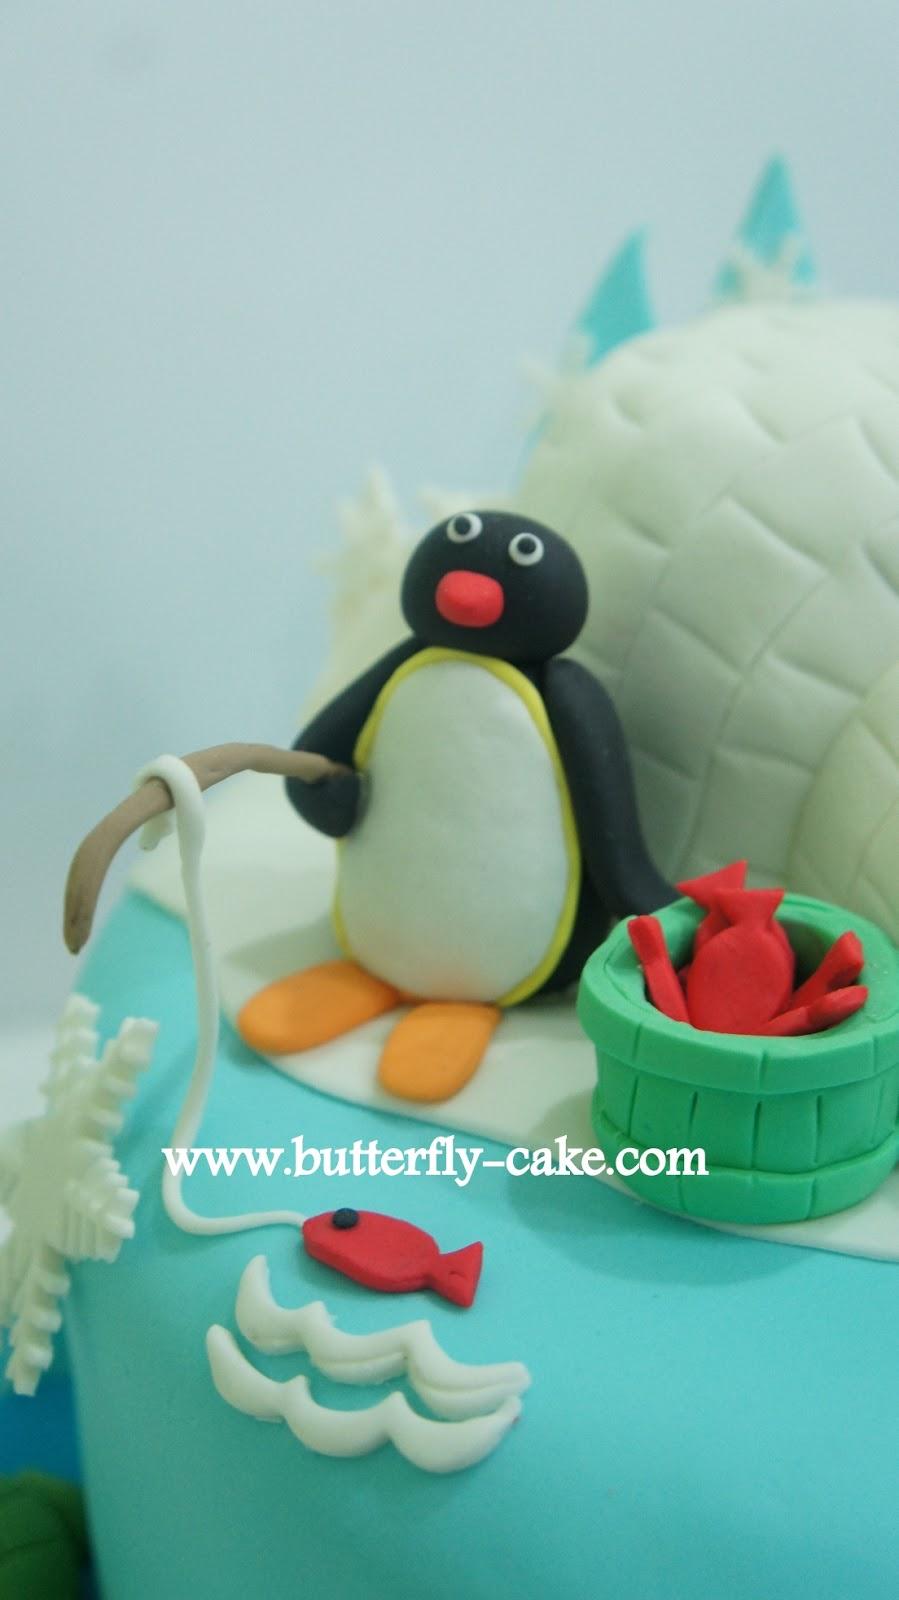 Butterfly Cake Pingu Cake For Kayla